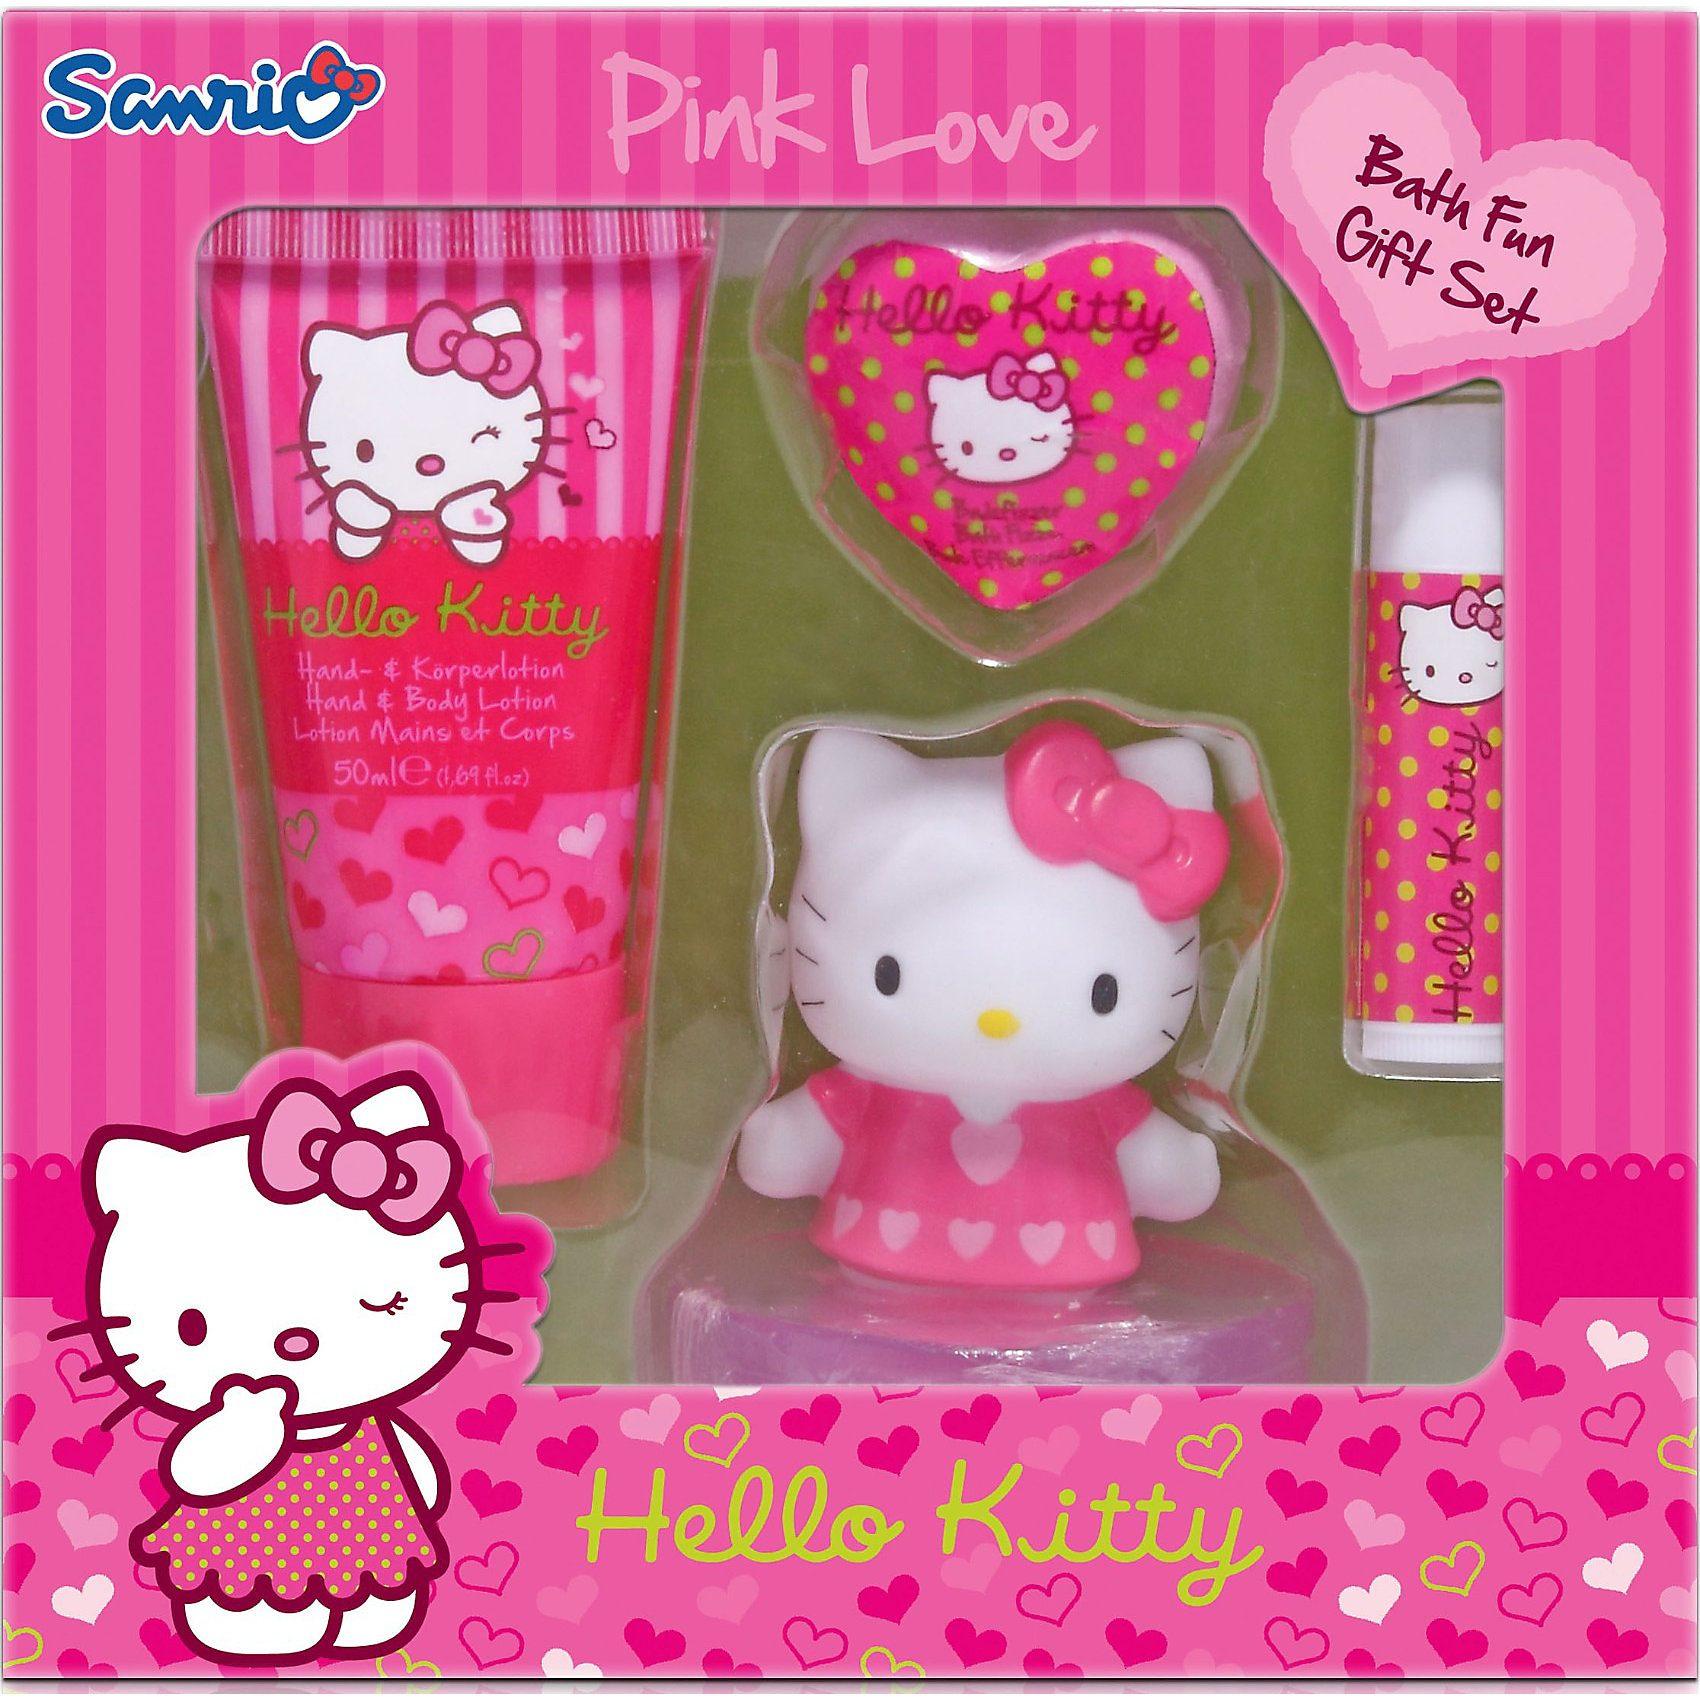 Badespaß Geschenkset, Hello Kitty, 4-tlg.